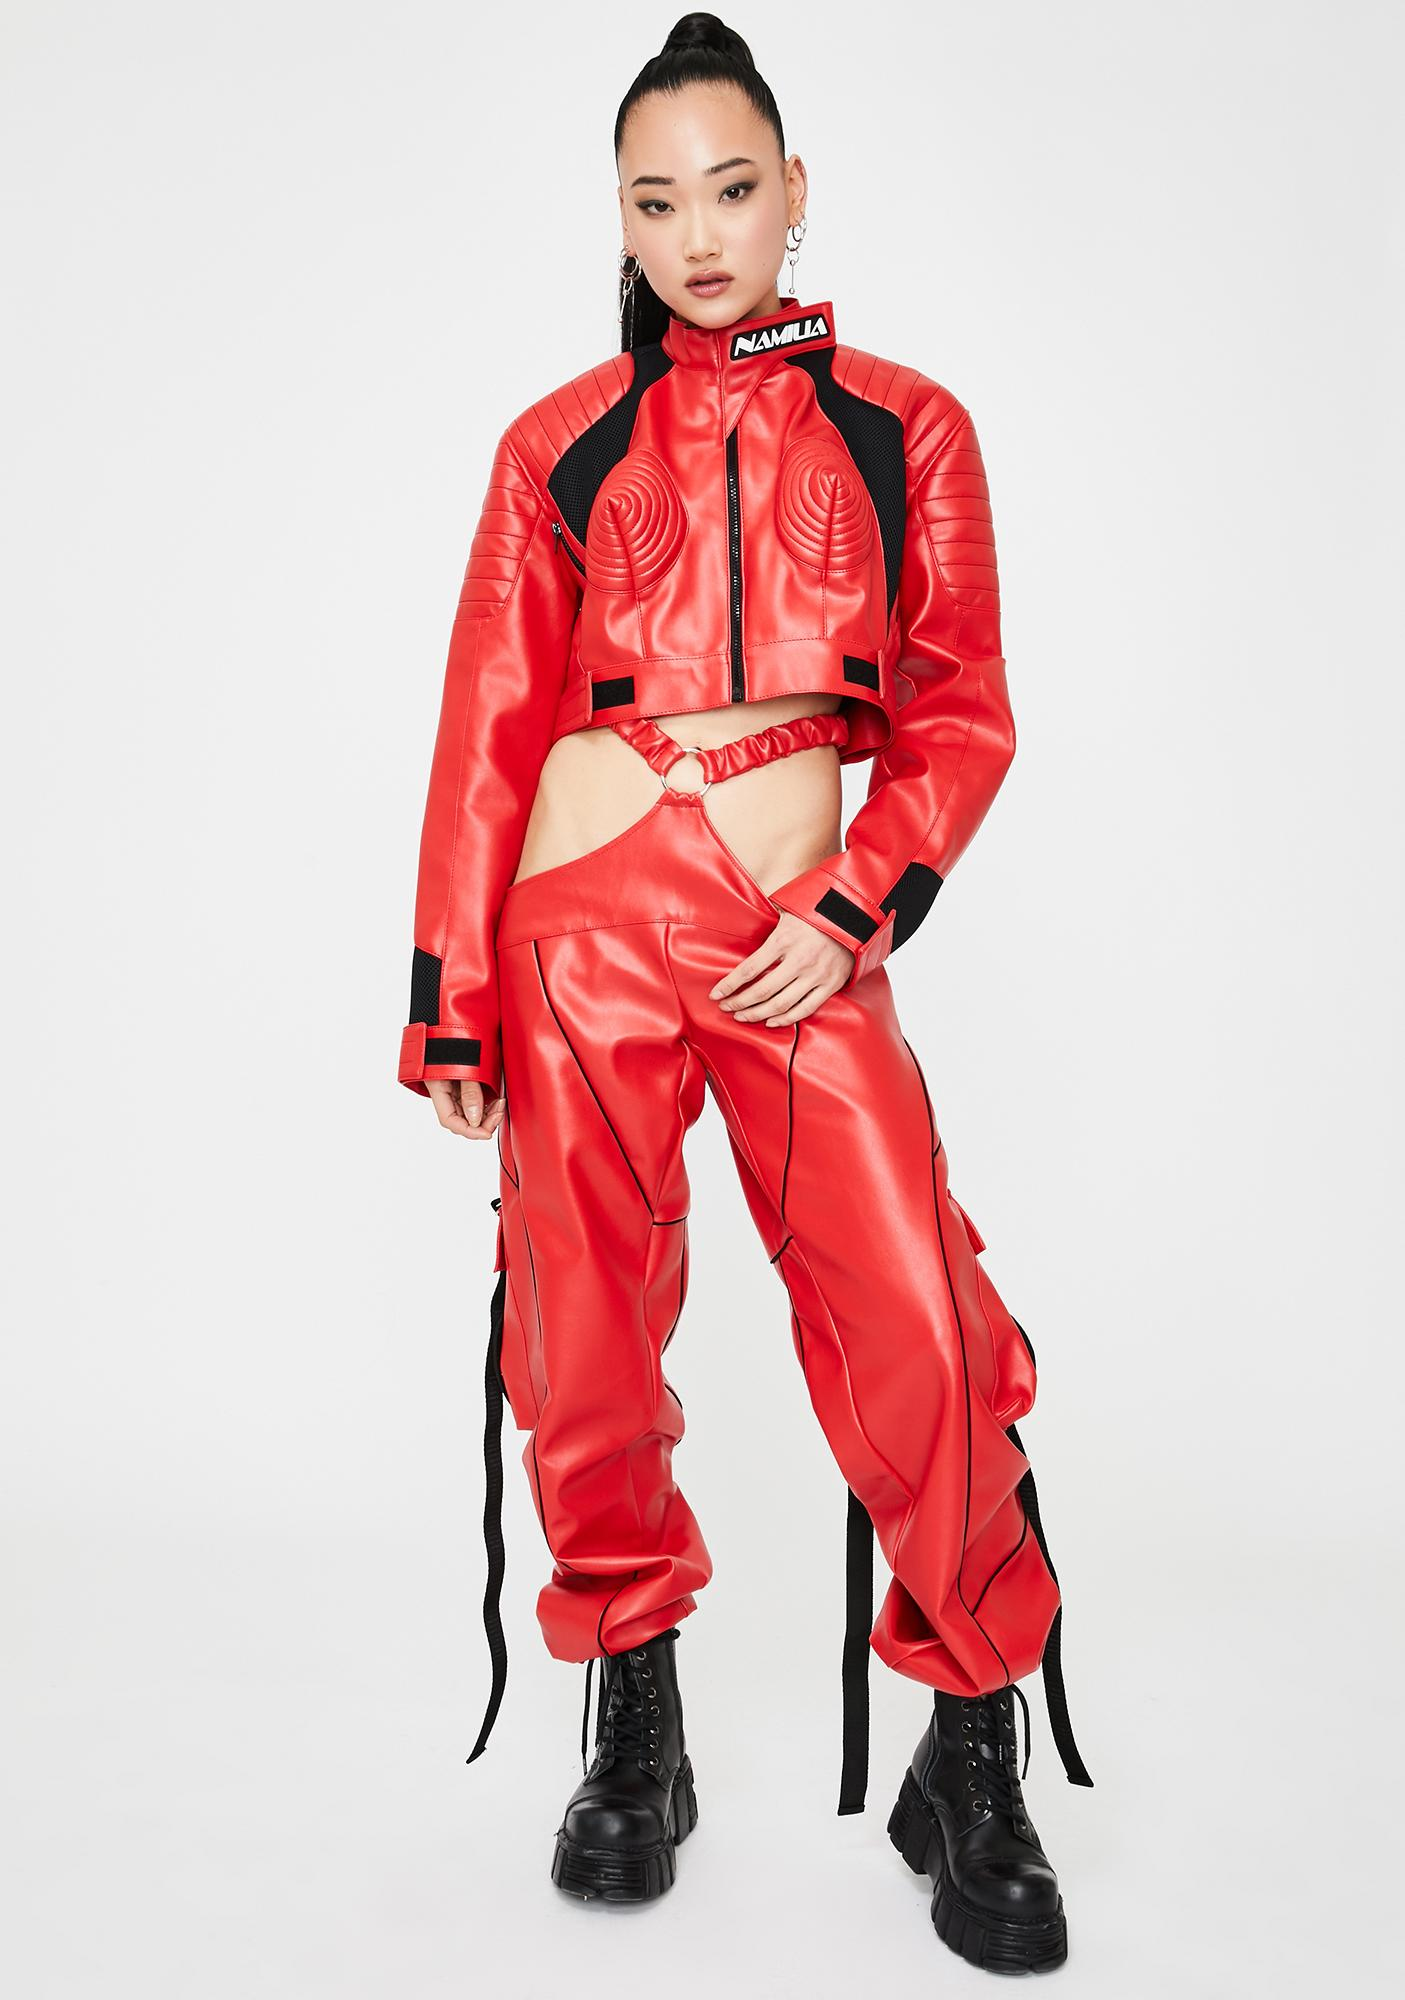 Namilia Red Motocross Cone Jacket